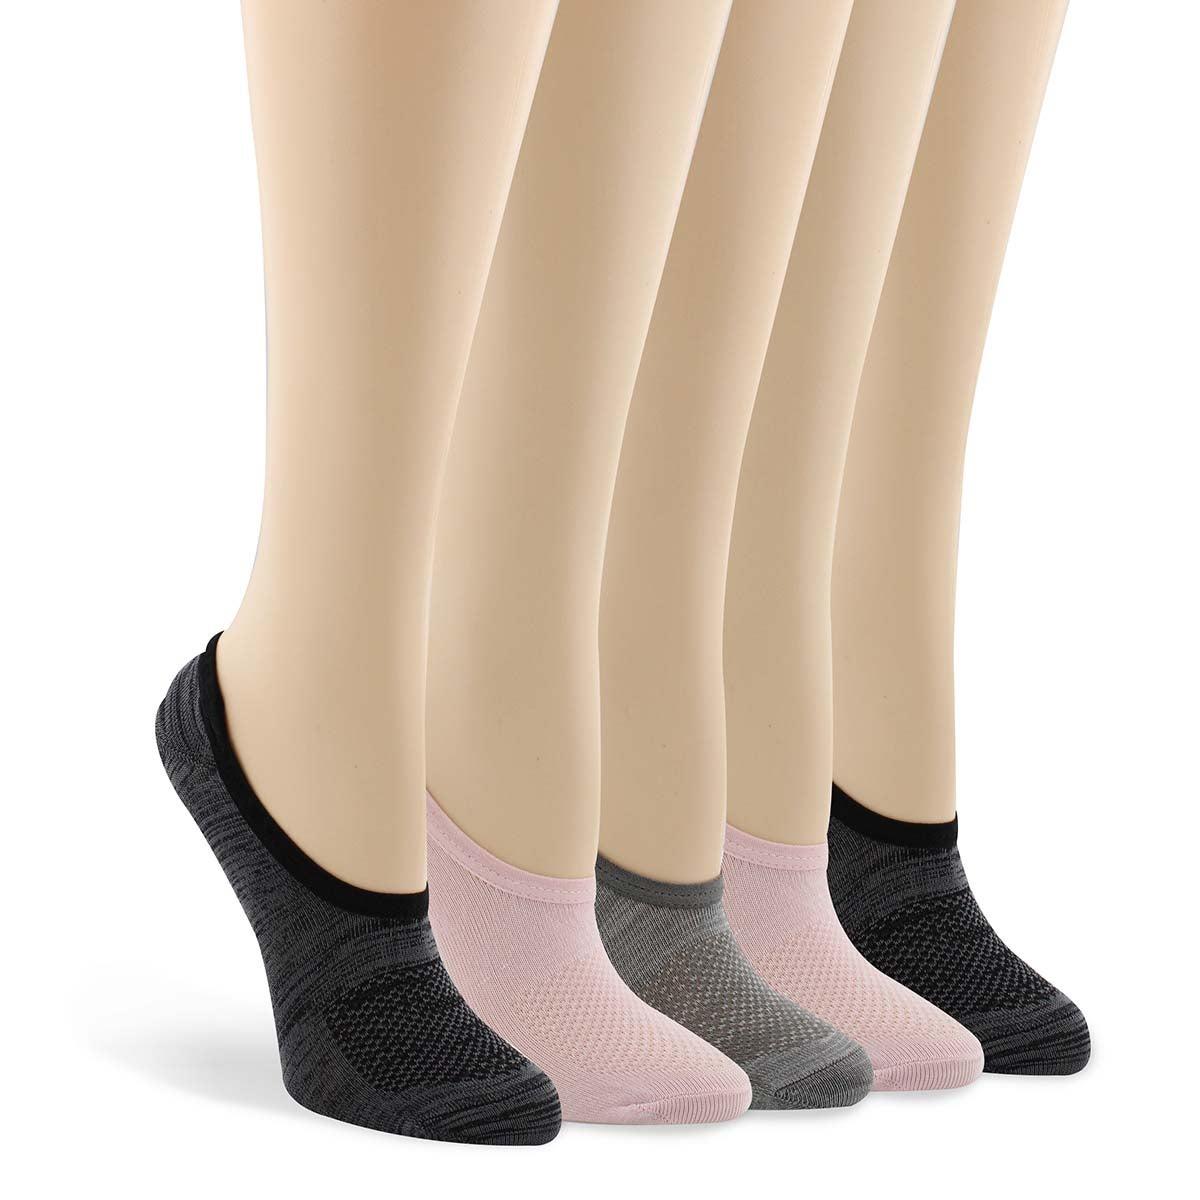 Socquette NOSHOW NONTERRY rose/gris femmes 5paires